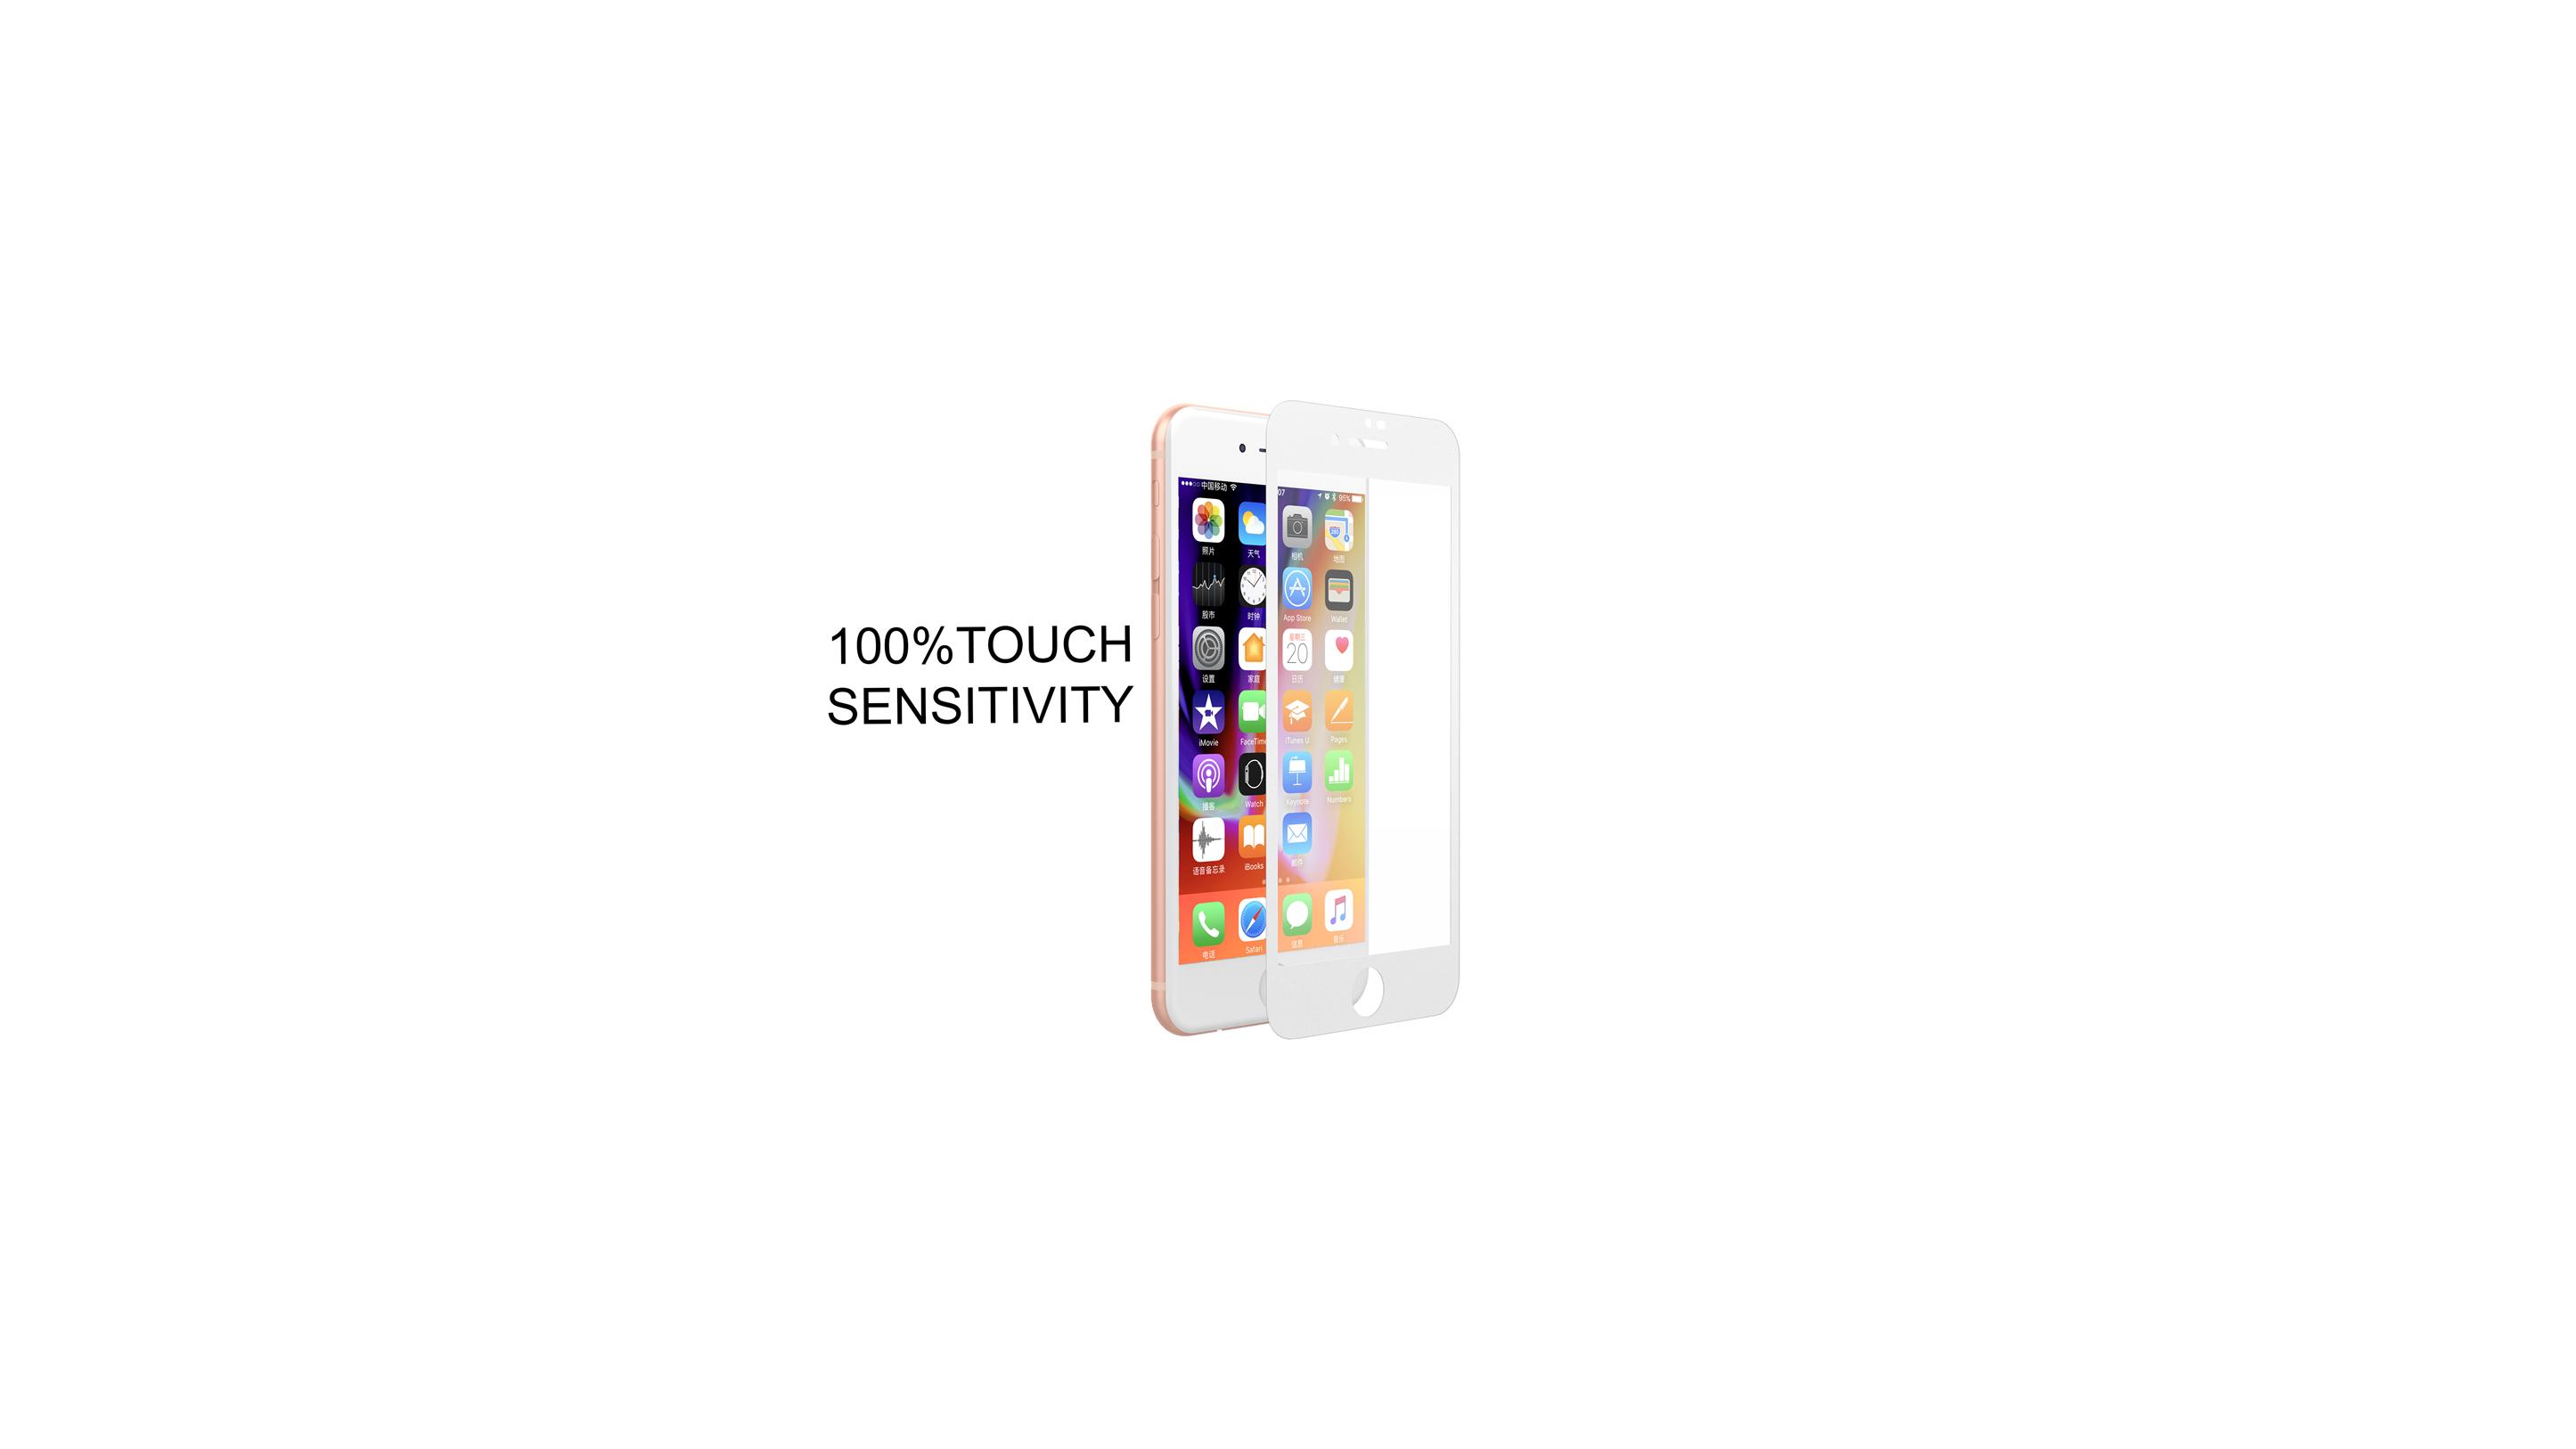 iPhone 6/7/8